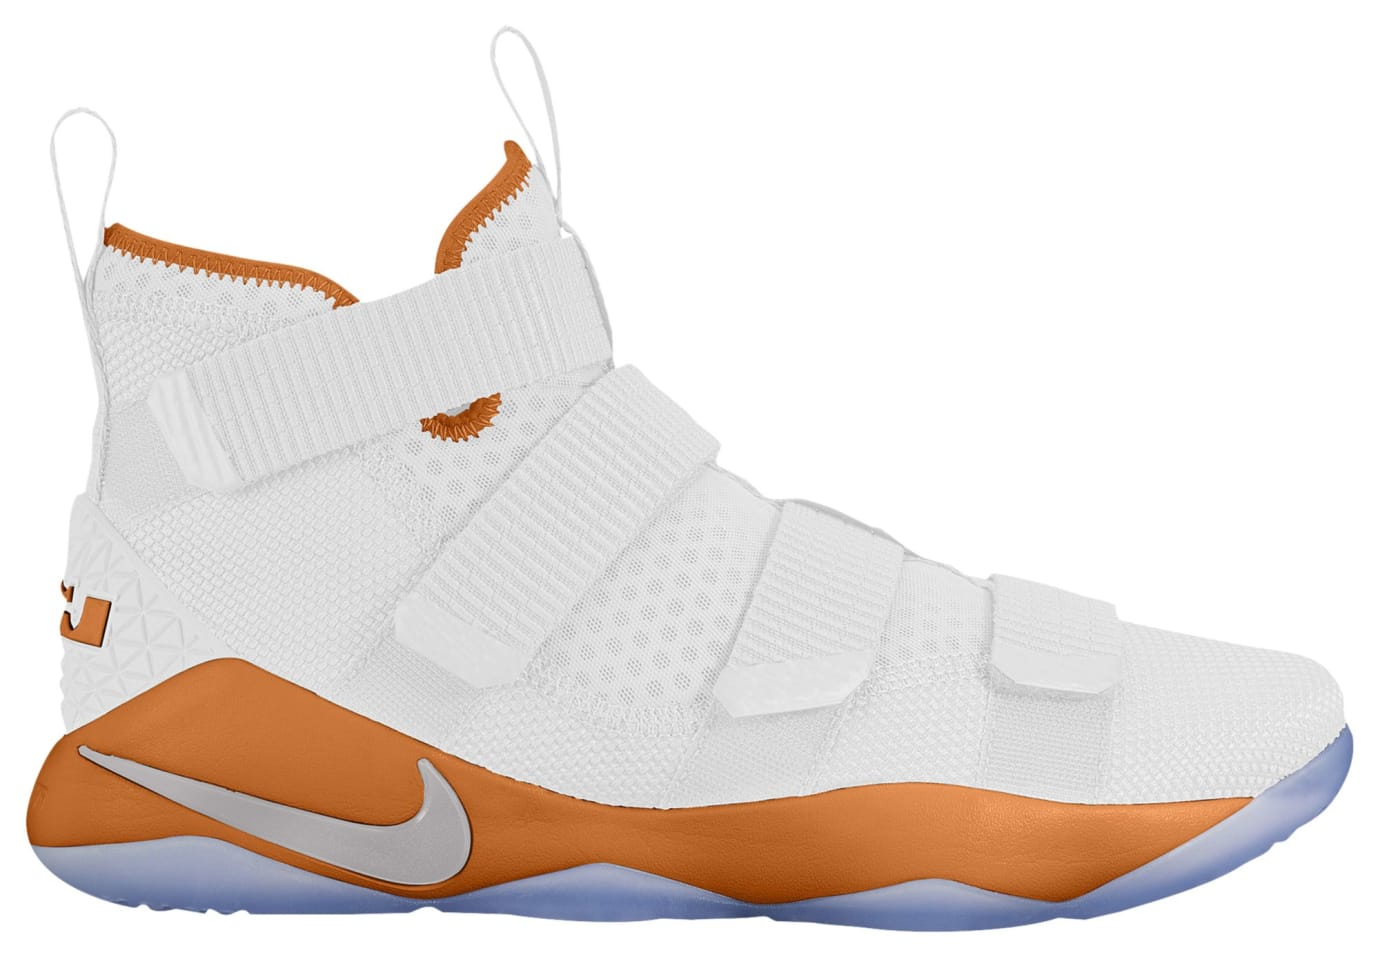 Nike LeBron Soldier 11 TB White Dark Orange